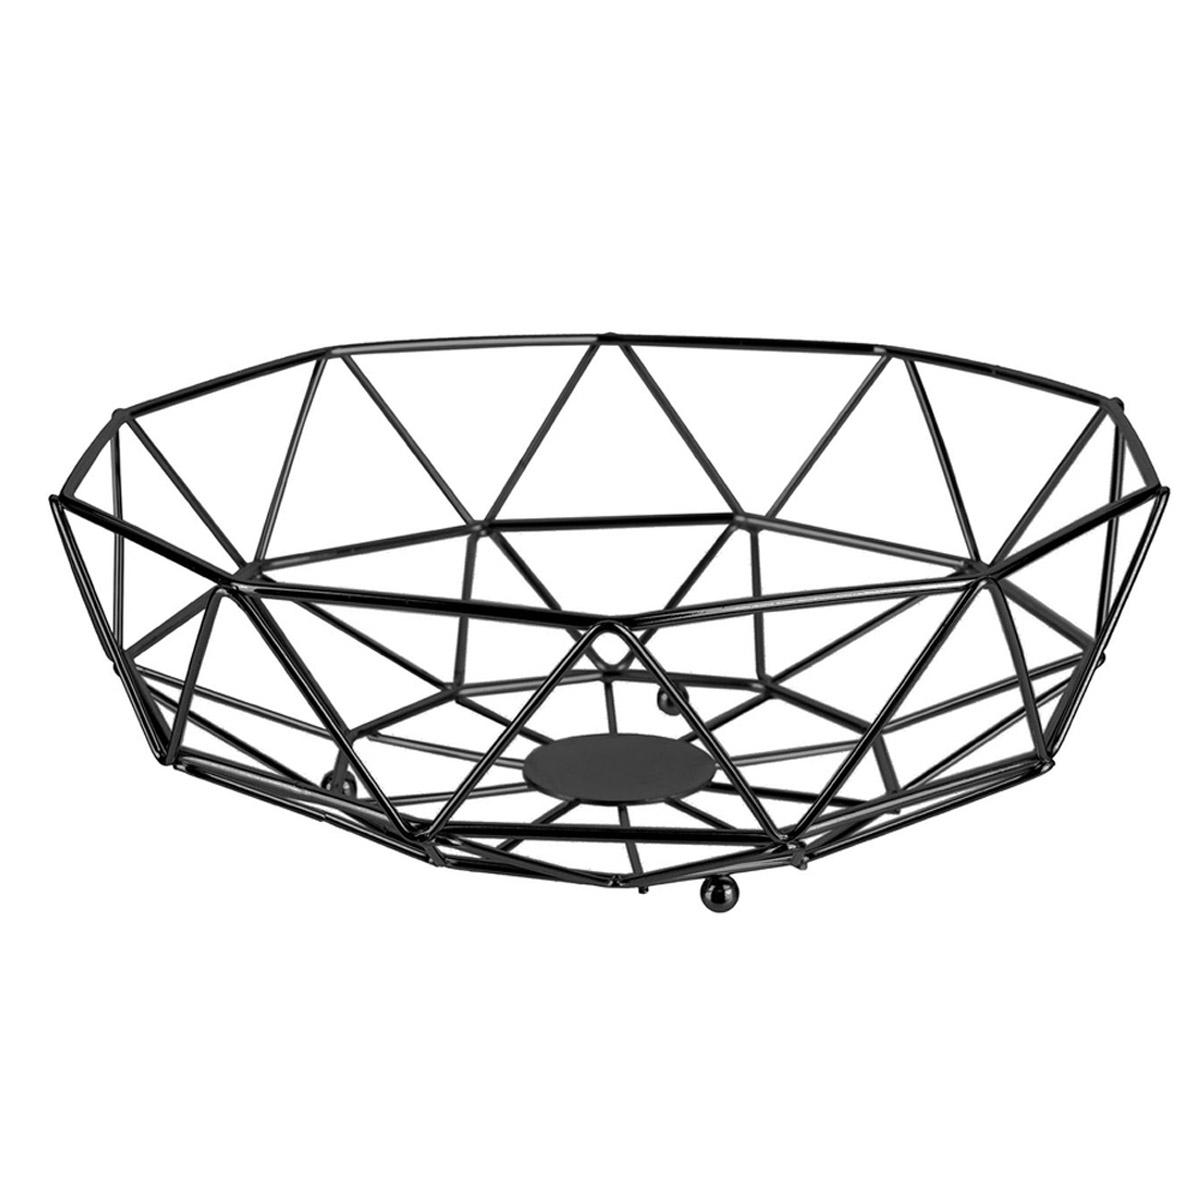 Corbeille filaire métal \'Boho\' noir - 28x10 cm - [R2430]